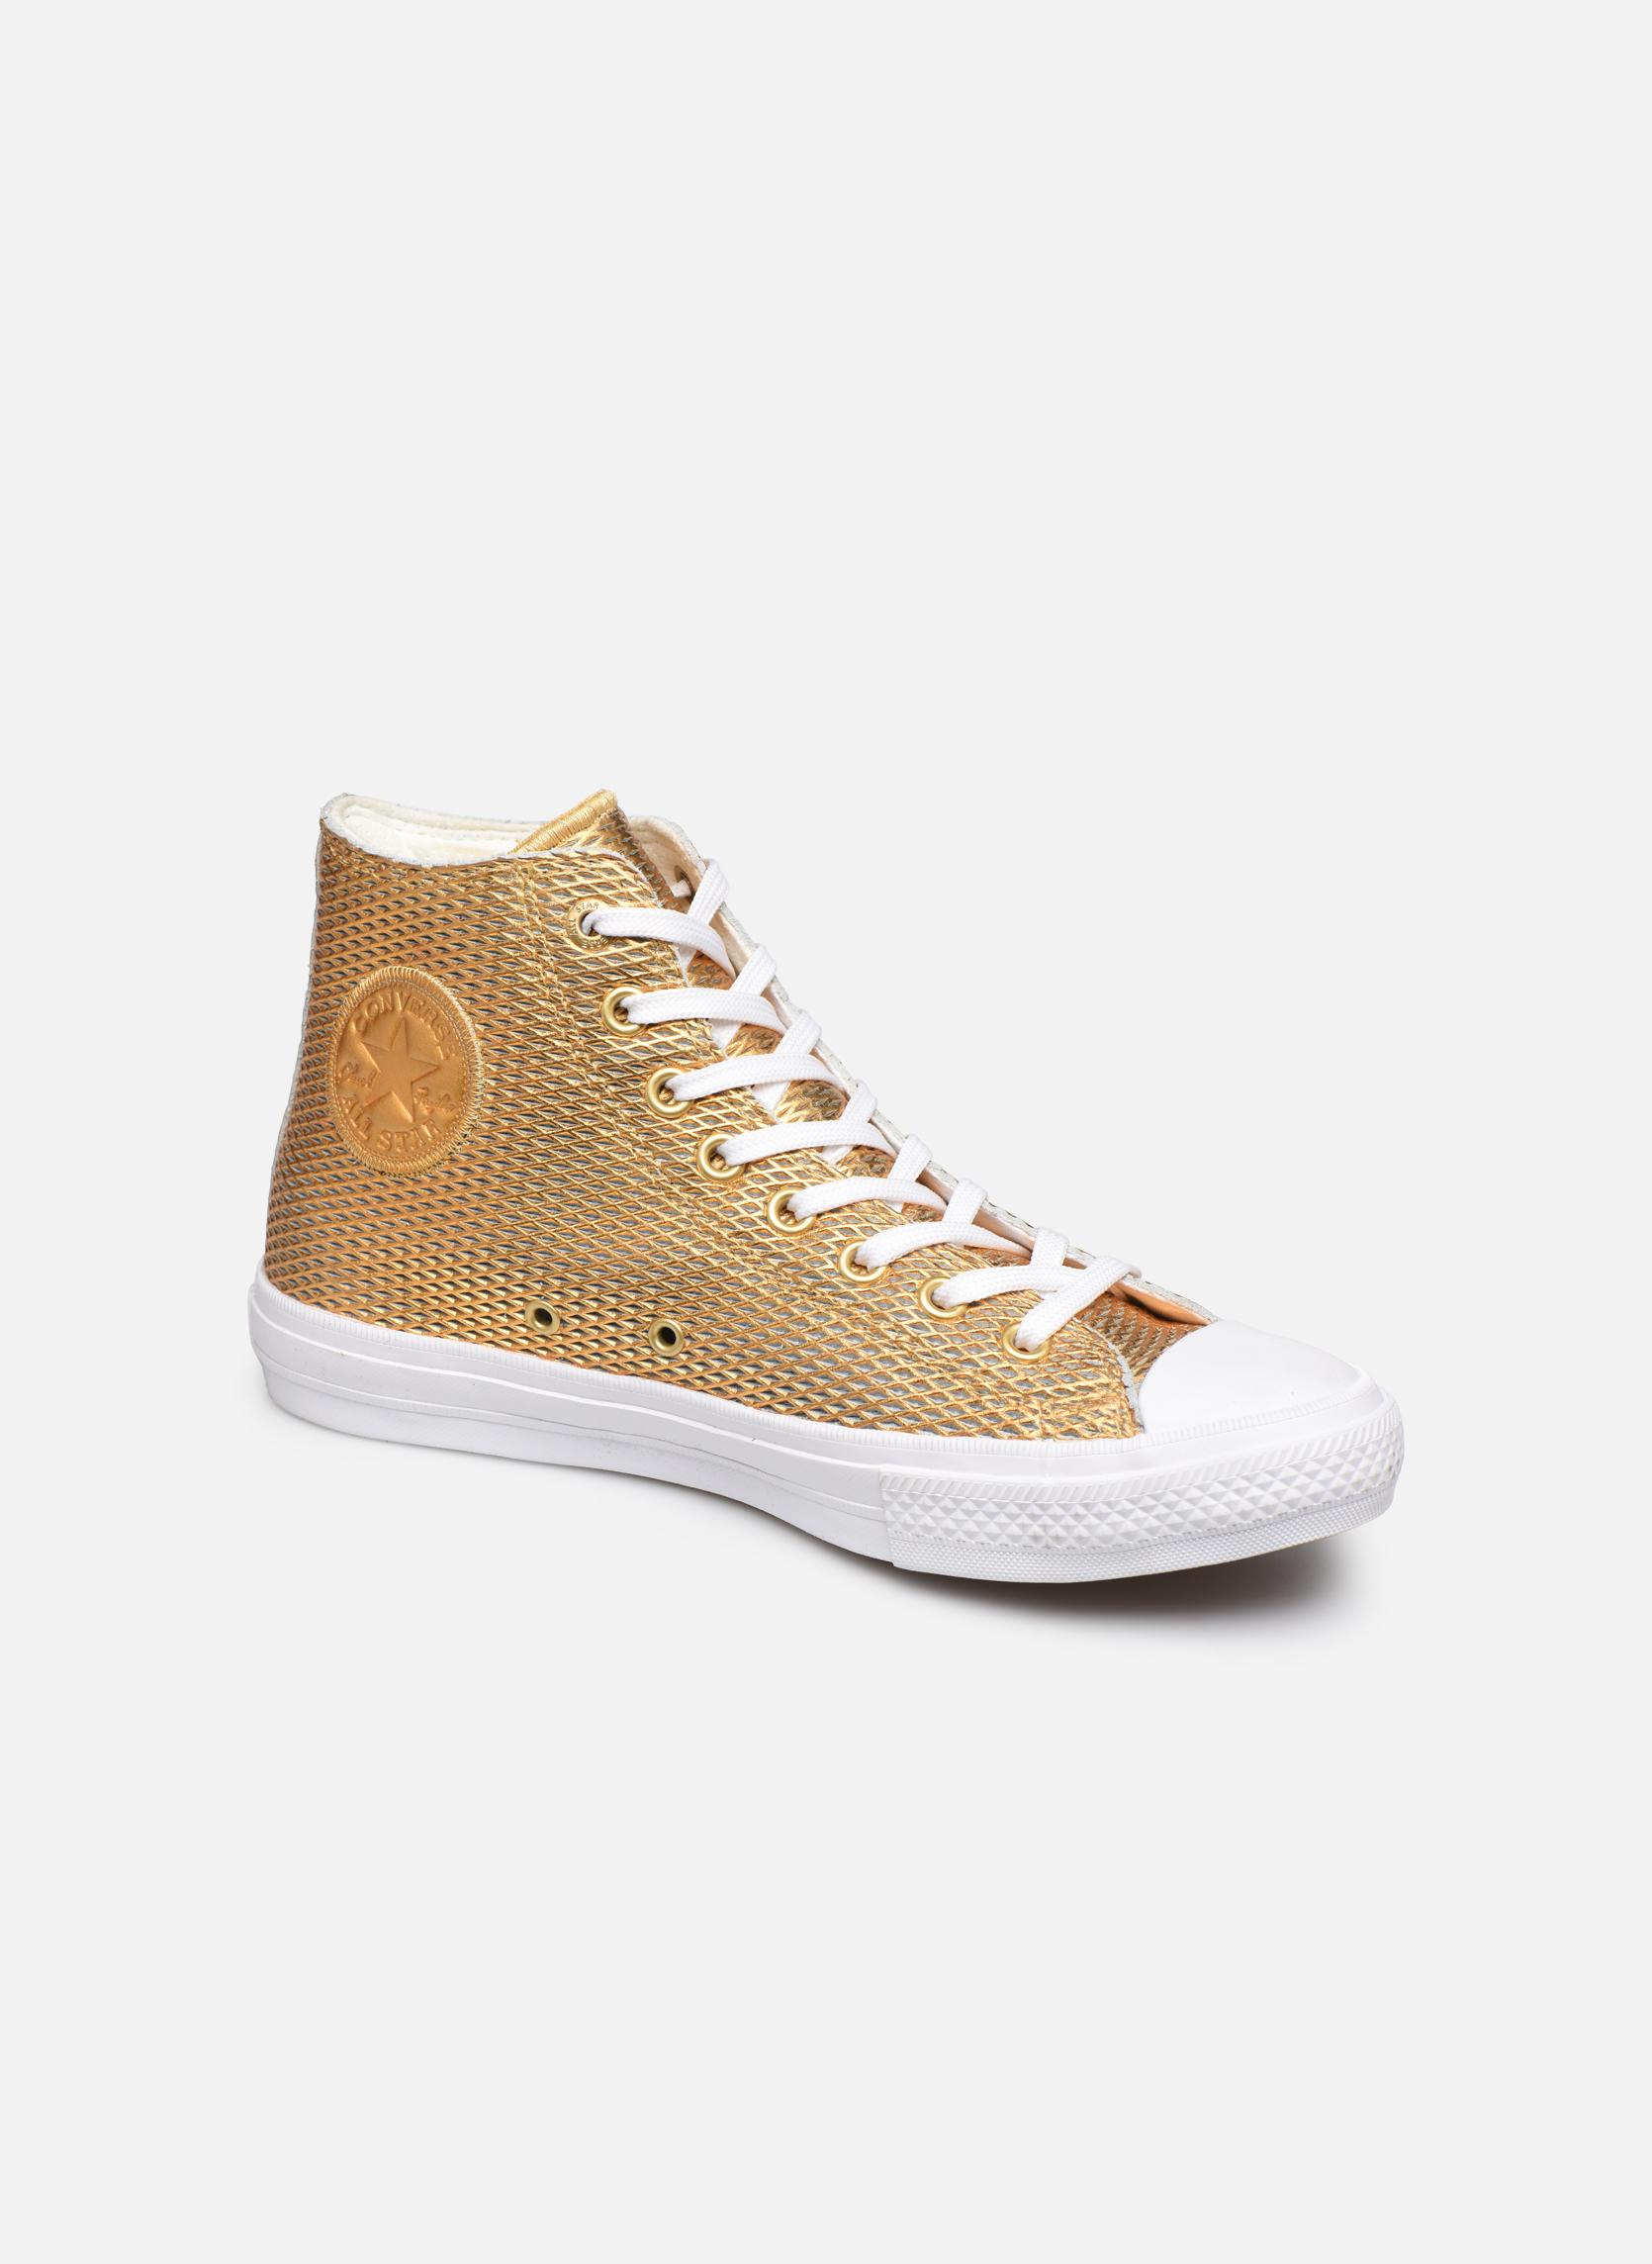 Sneaker Damen Chuck Taylor All Star II Hi Perf Metallic Leather